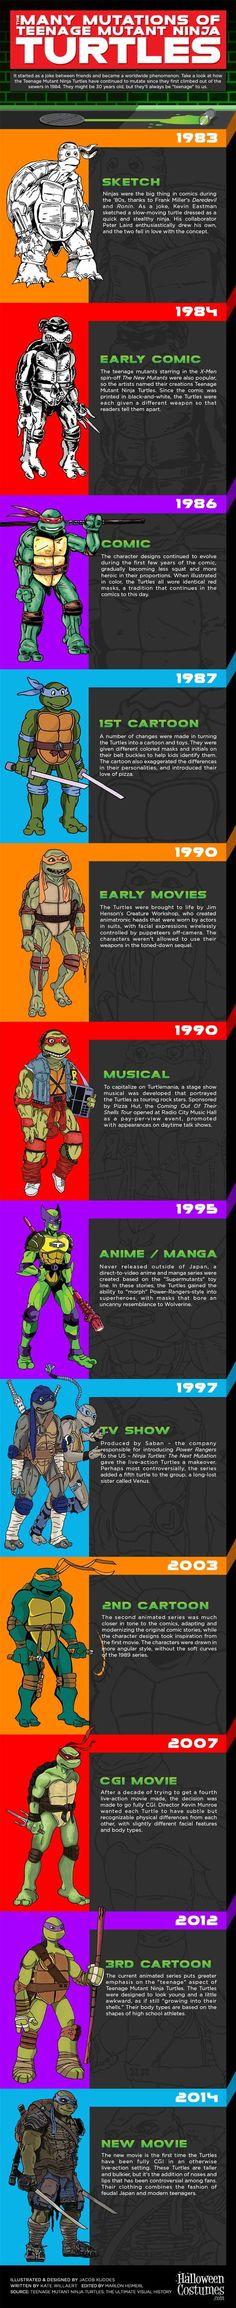 Turtles evolution